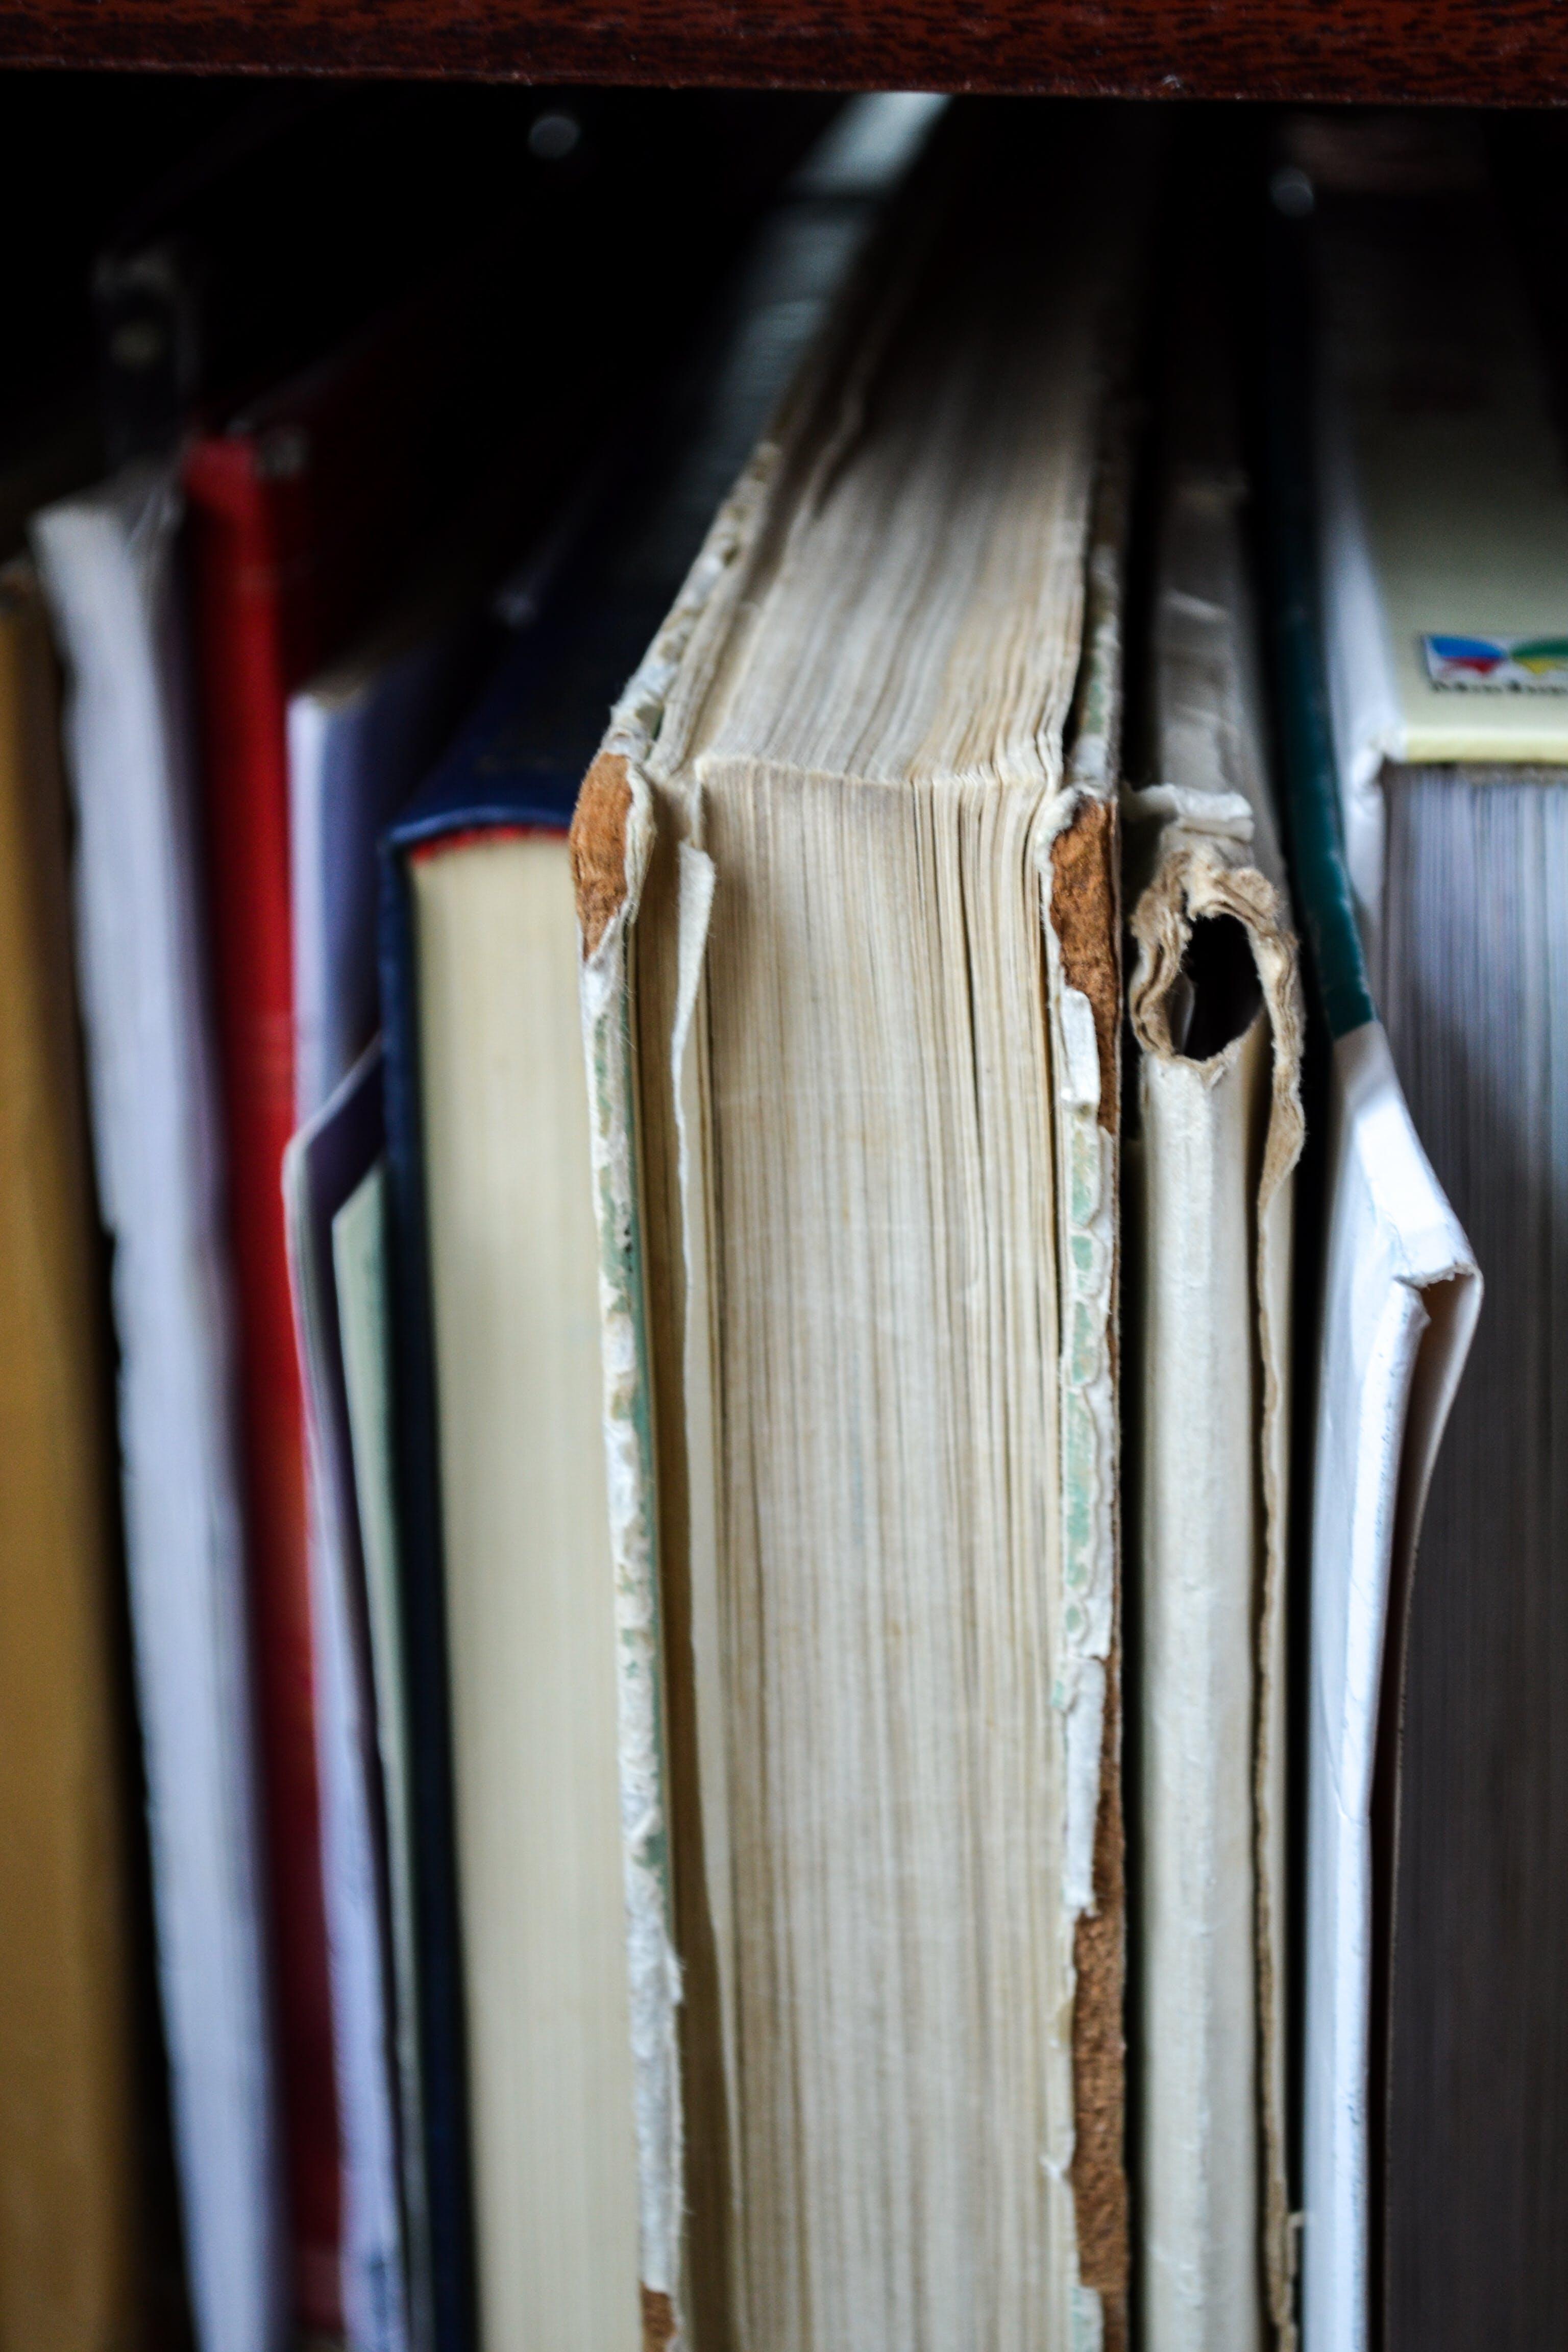 Closeup Photo of Book Filed on Shelf